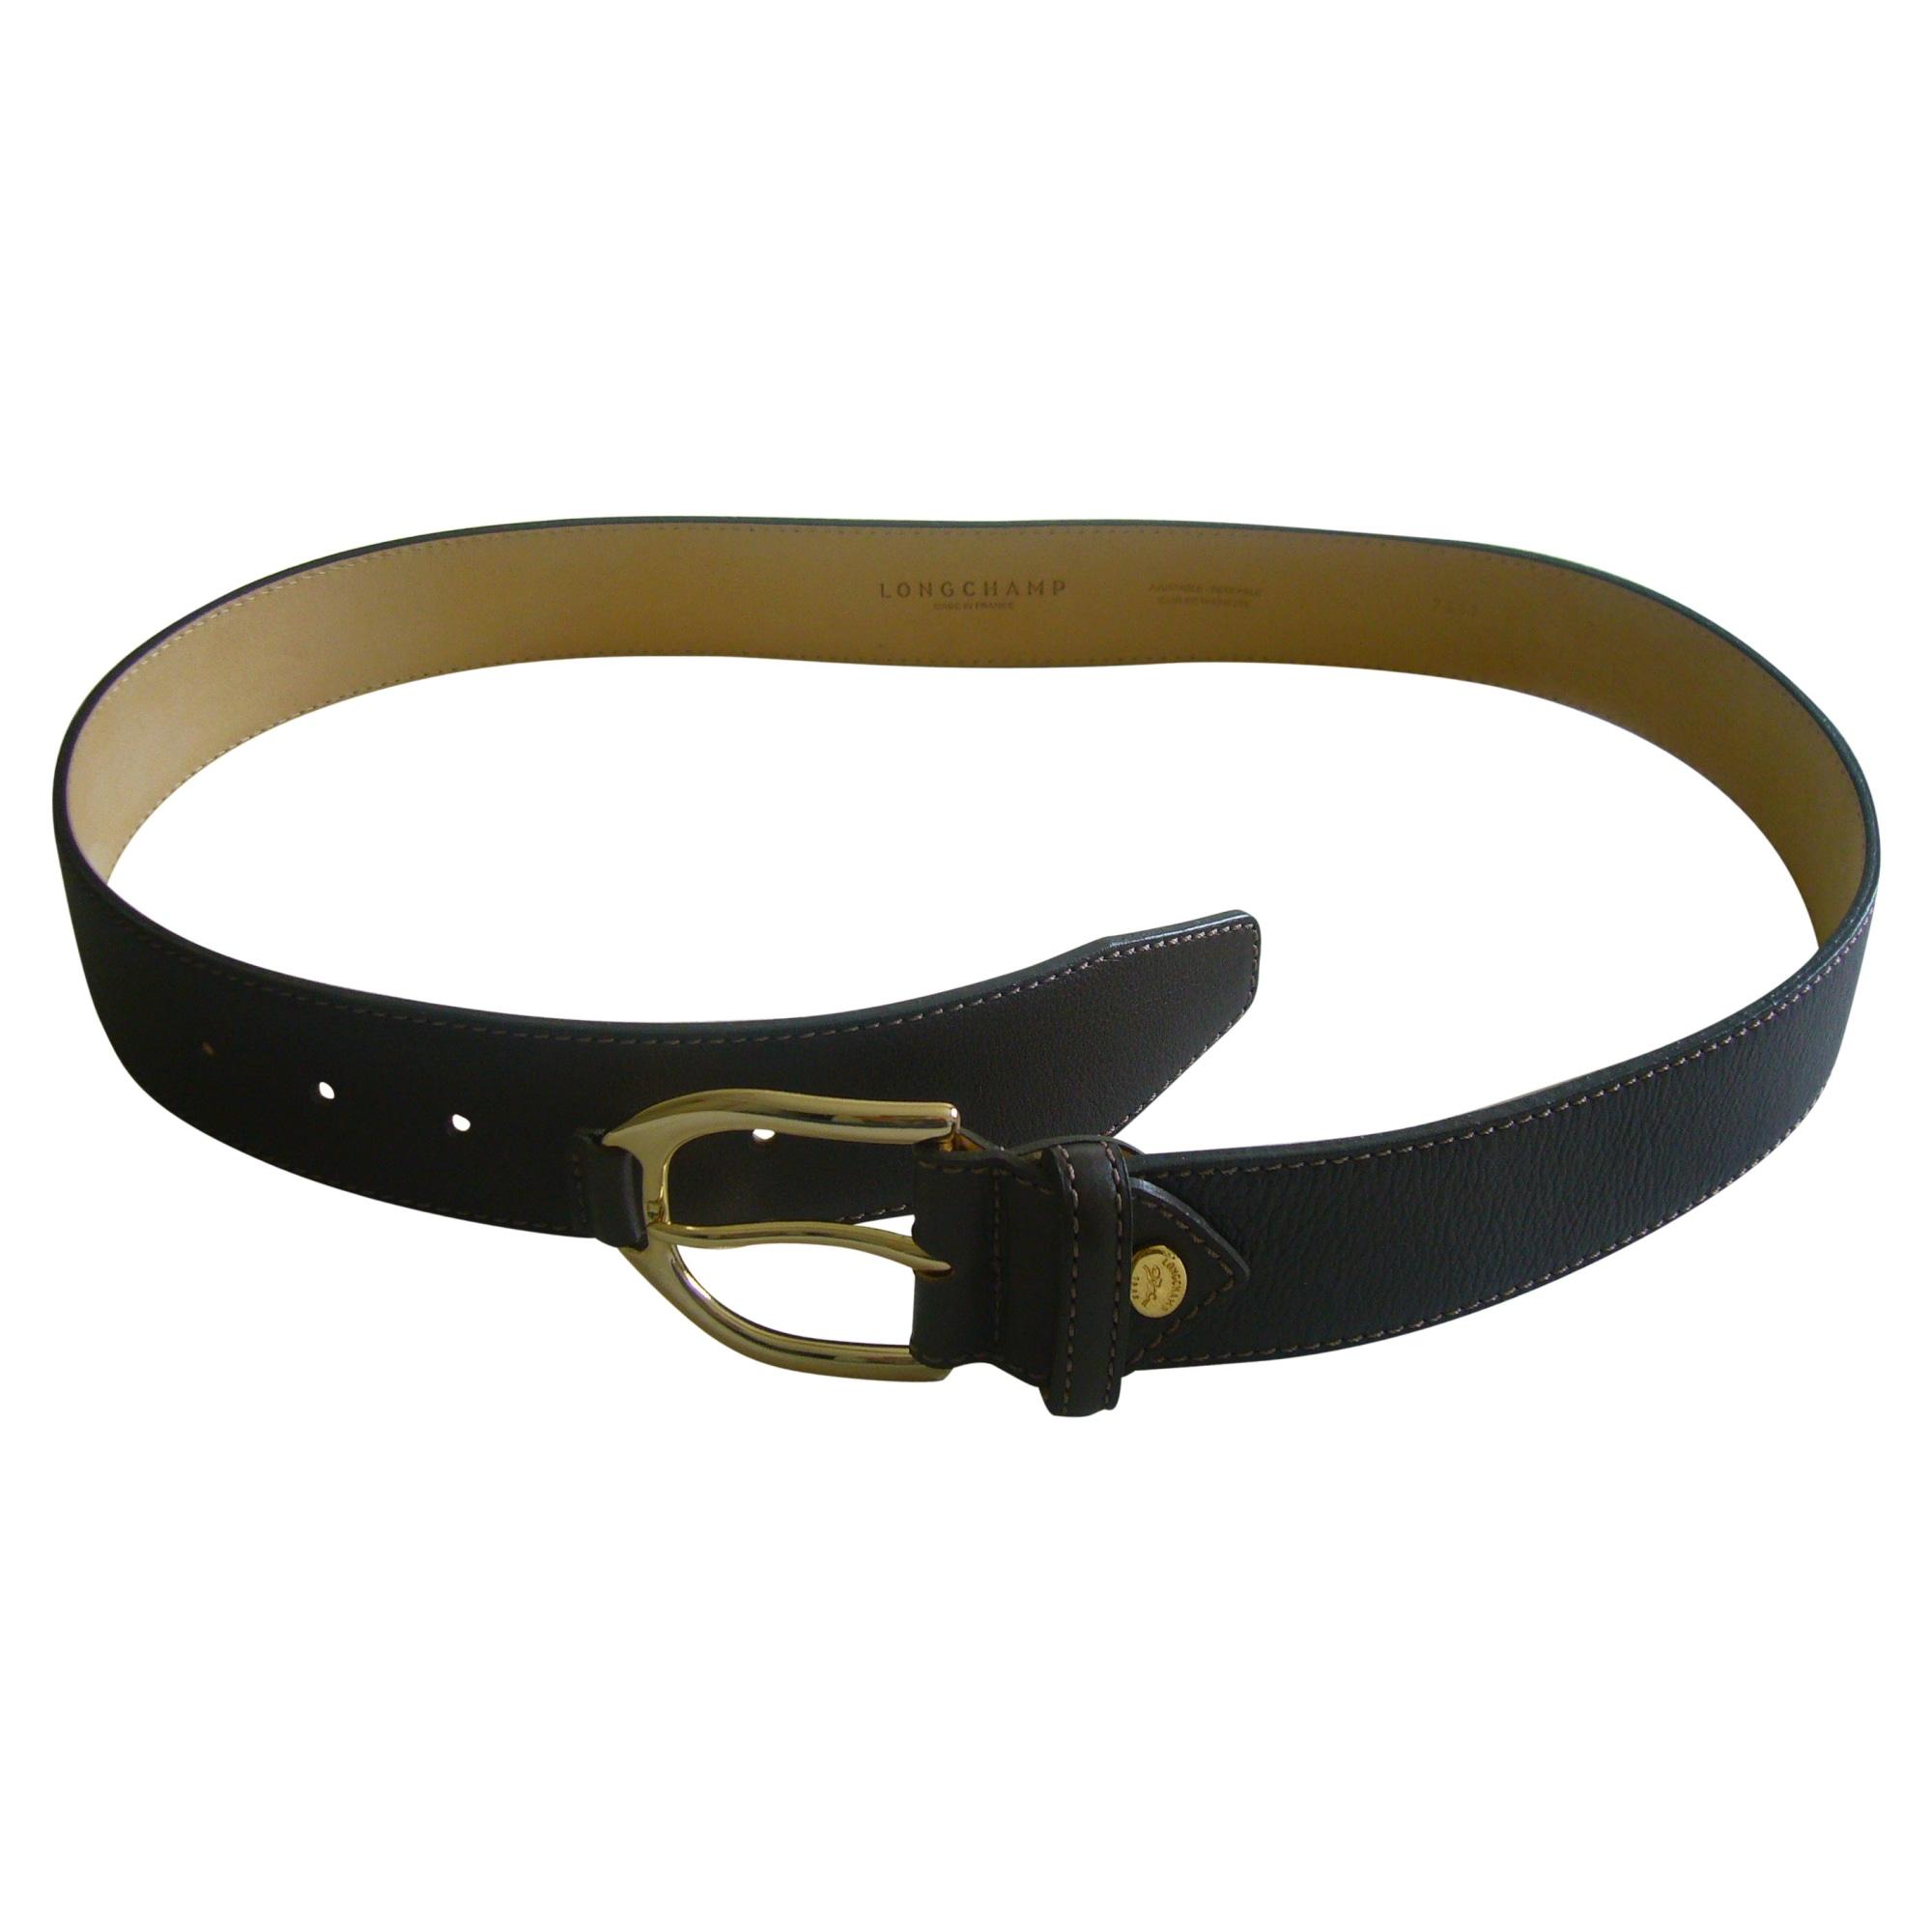 Meilleur Outlet connu Noir Noir-Vachetta Tan-Blanche ceinture cuir femme  longchamp - skoul.fr. b1709004810